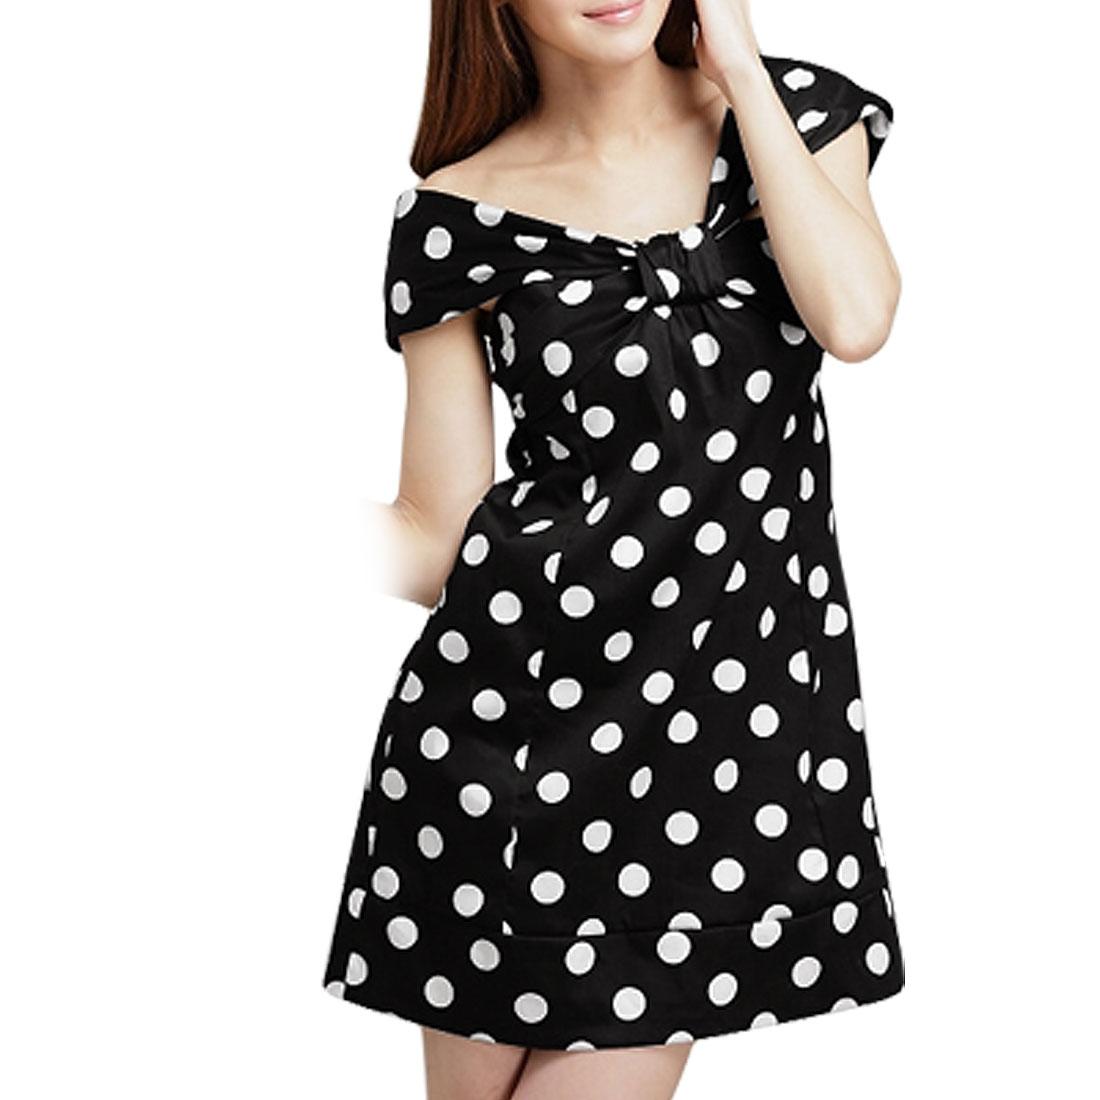 Ladies Black Elastic Smocked Back Mini Dotted Dress XS